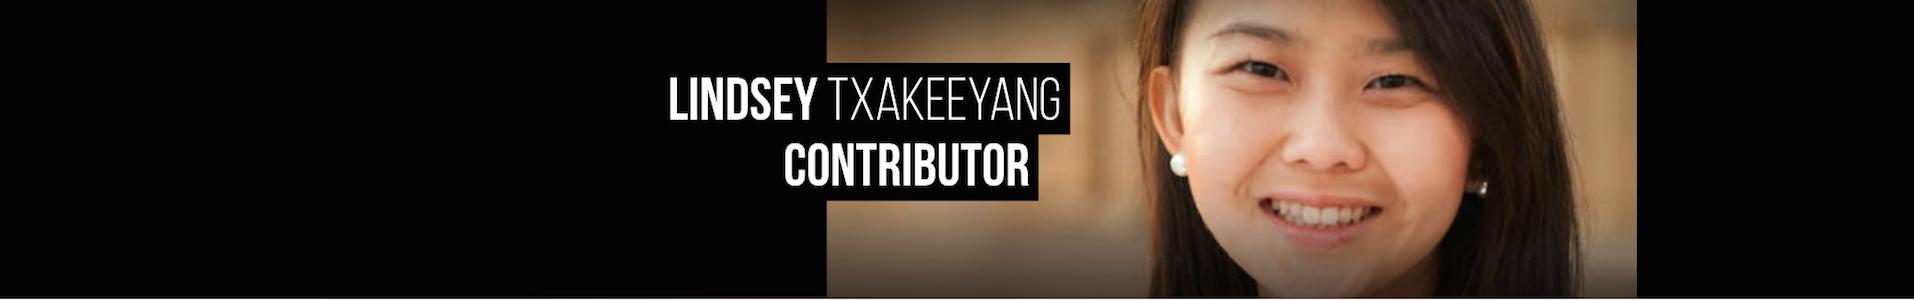 Lindsey Txakeeyang Author Page Image